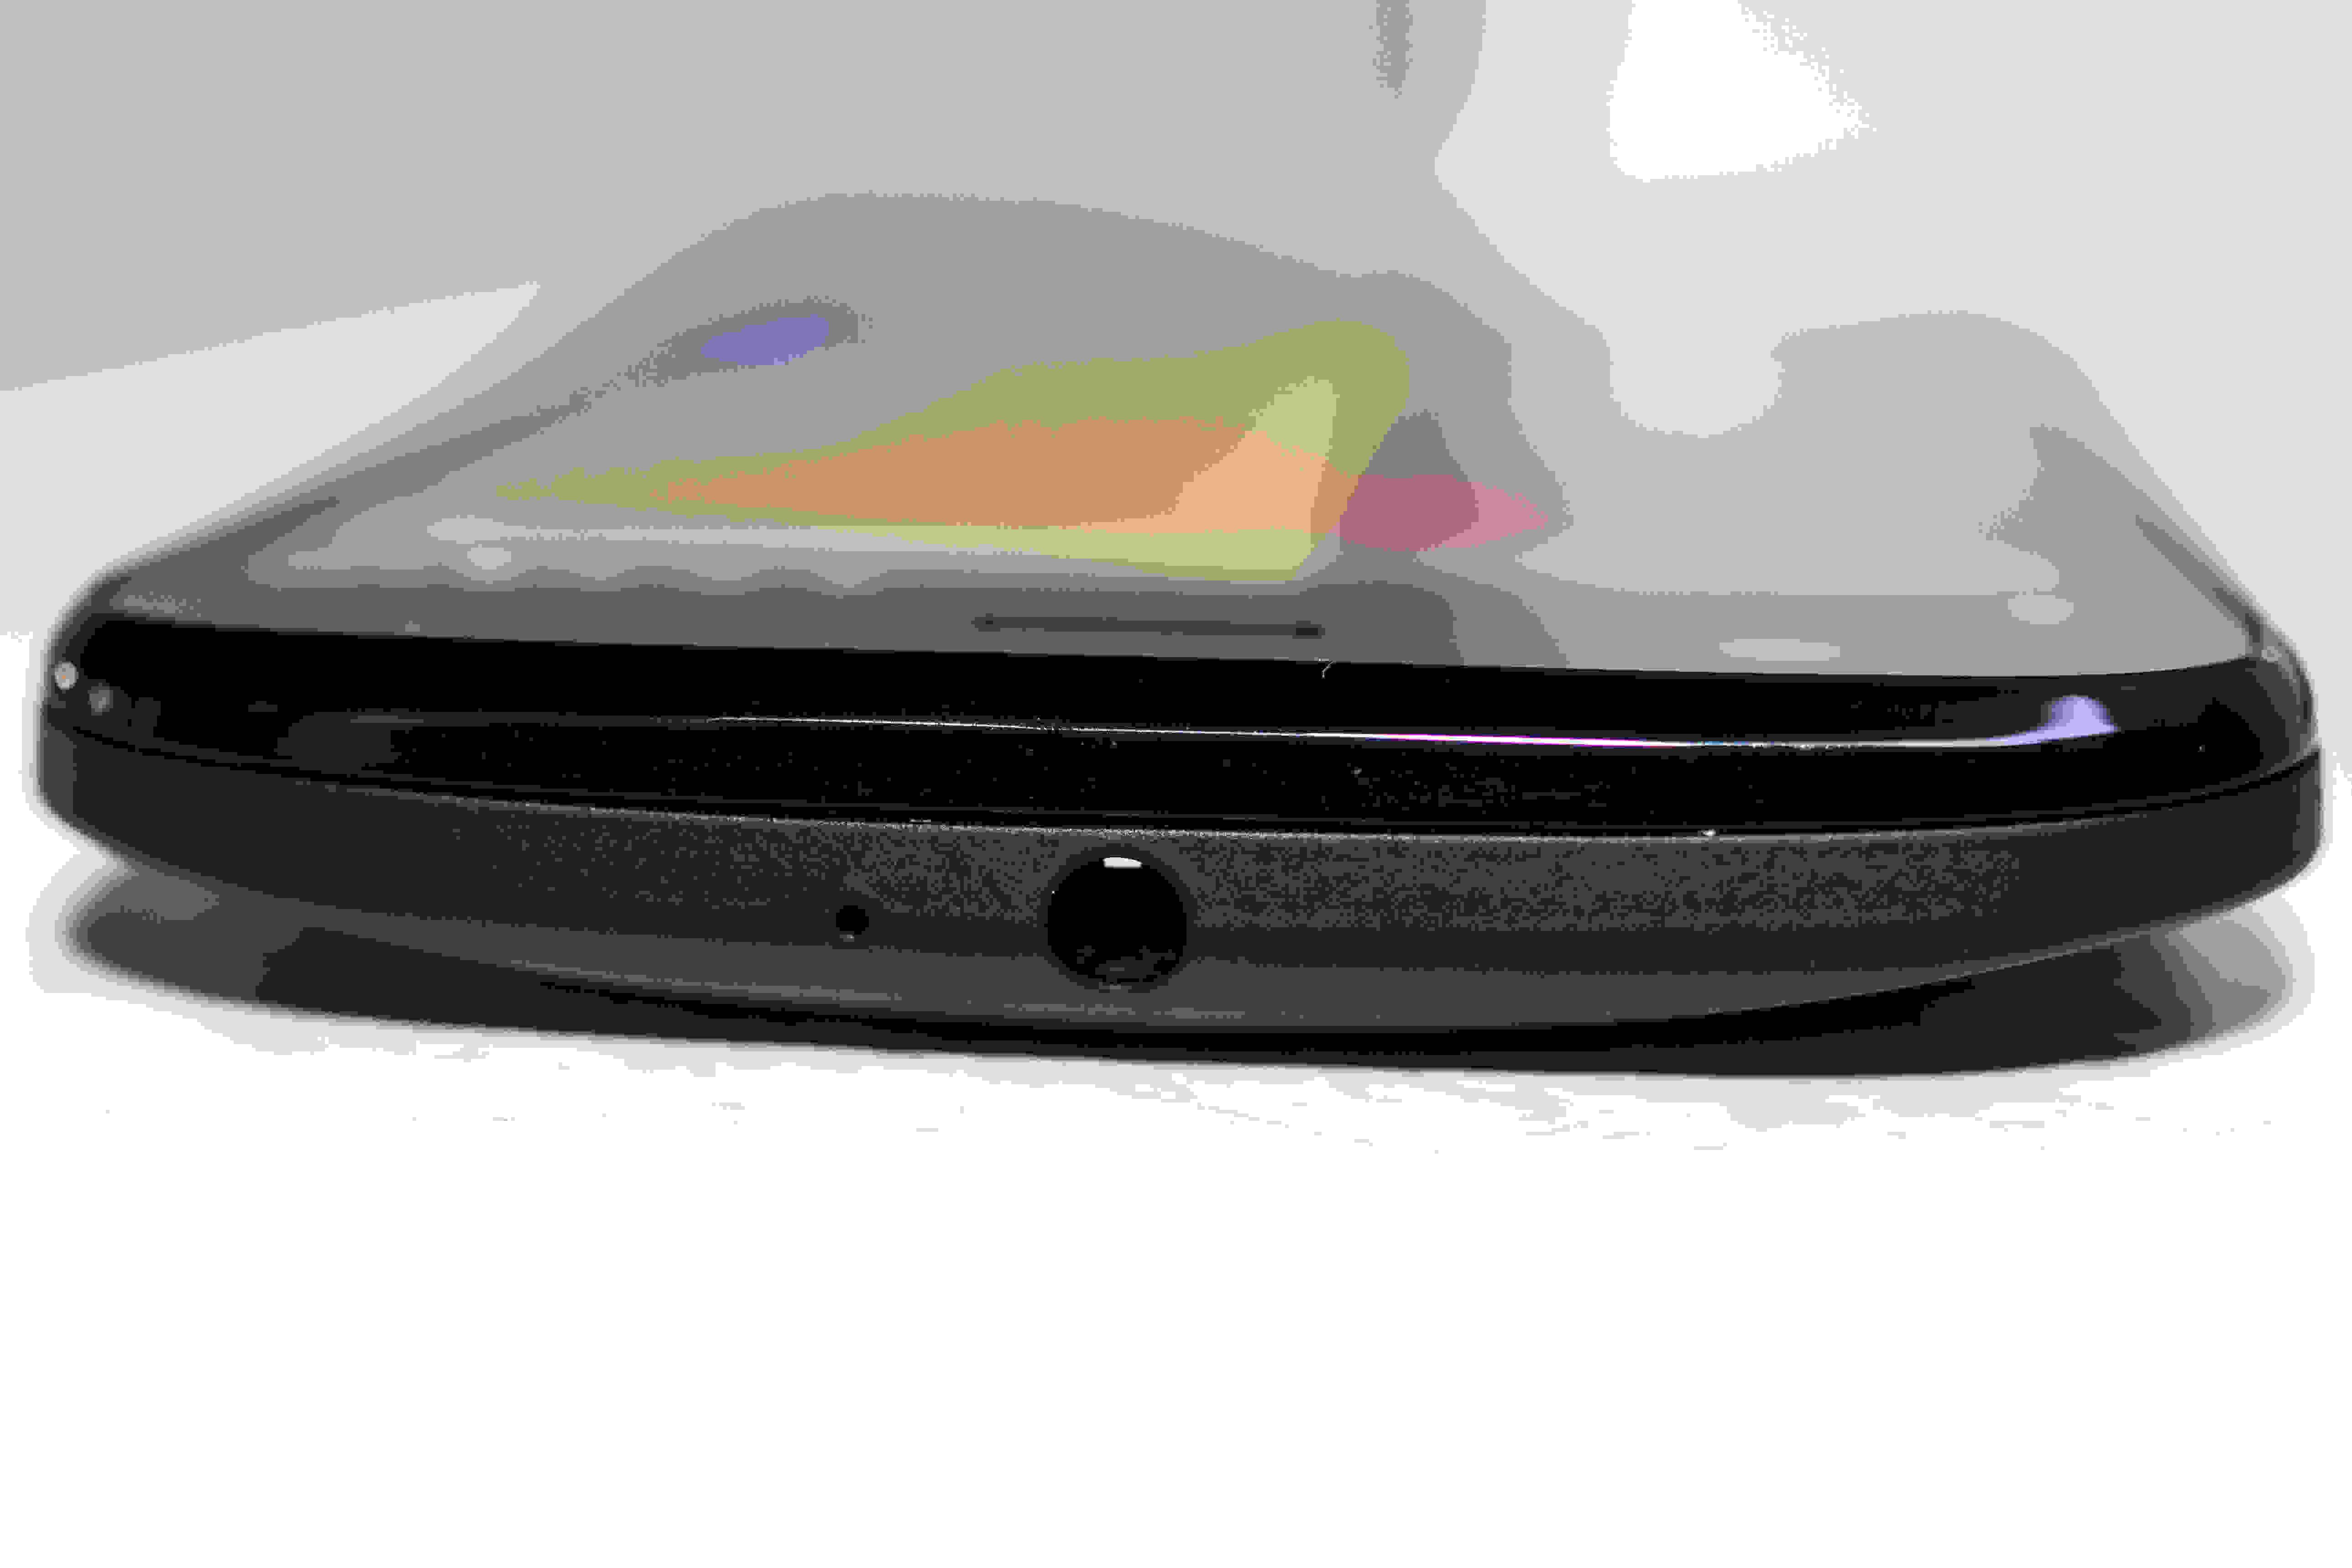 A photo of the Motorola Moto G with 4G LTE's headphone jack.